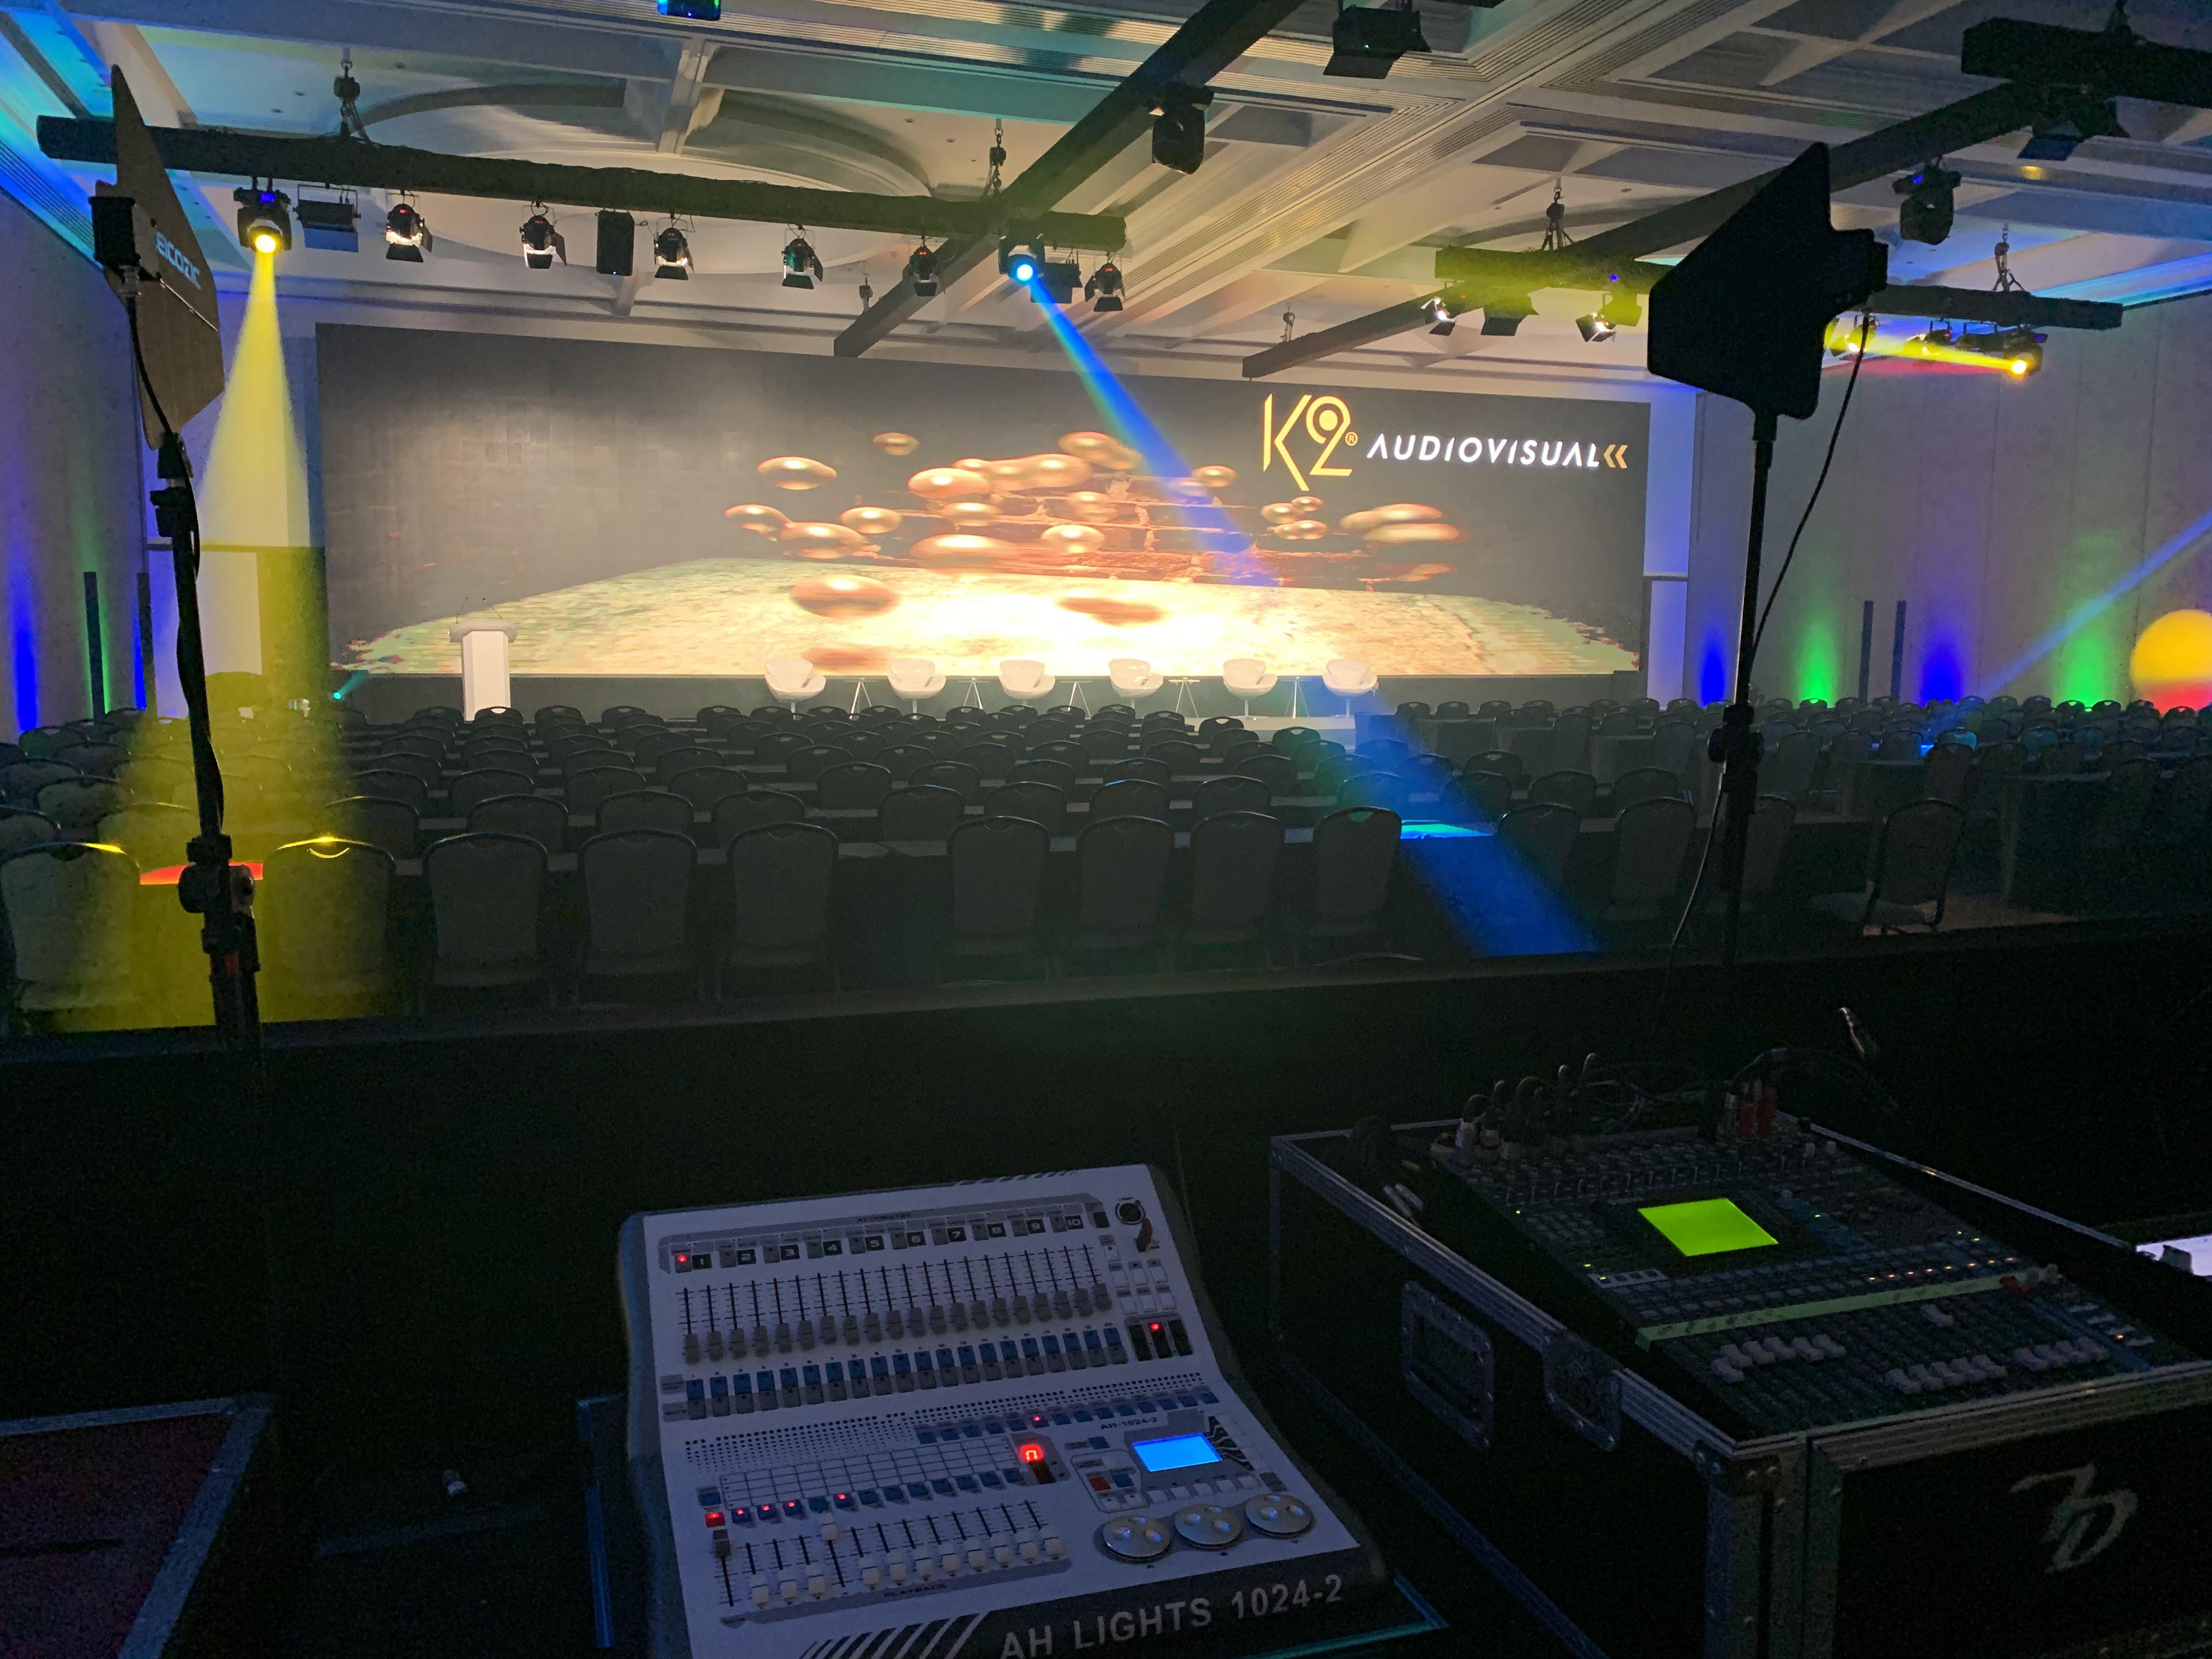 K2 Audiovisual